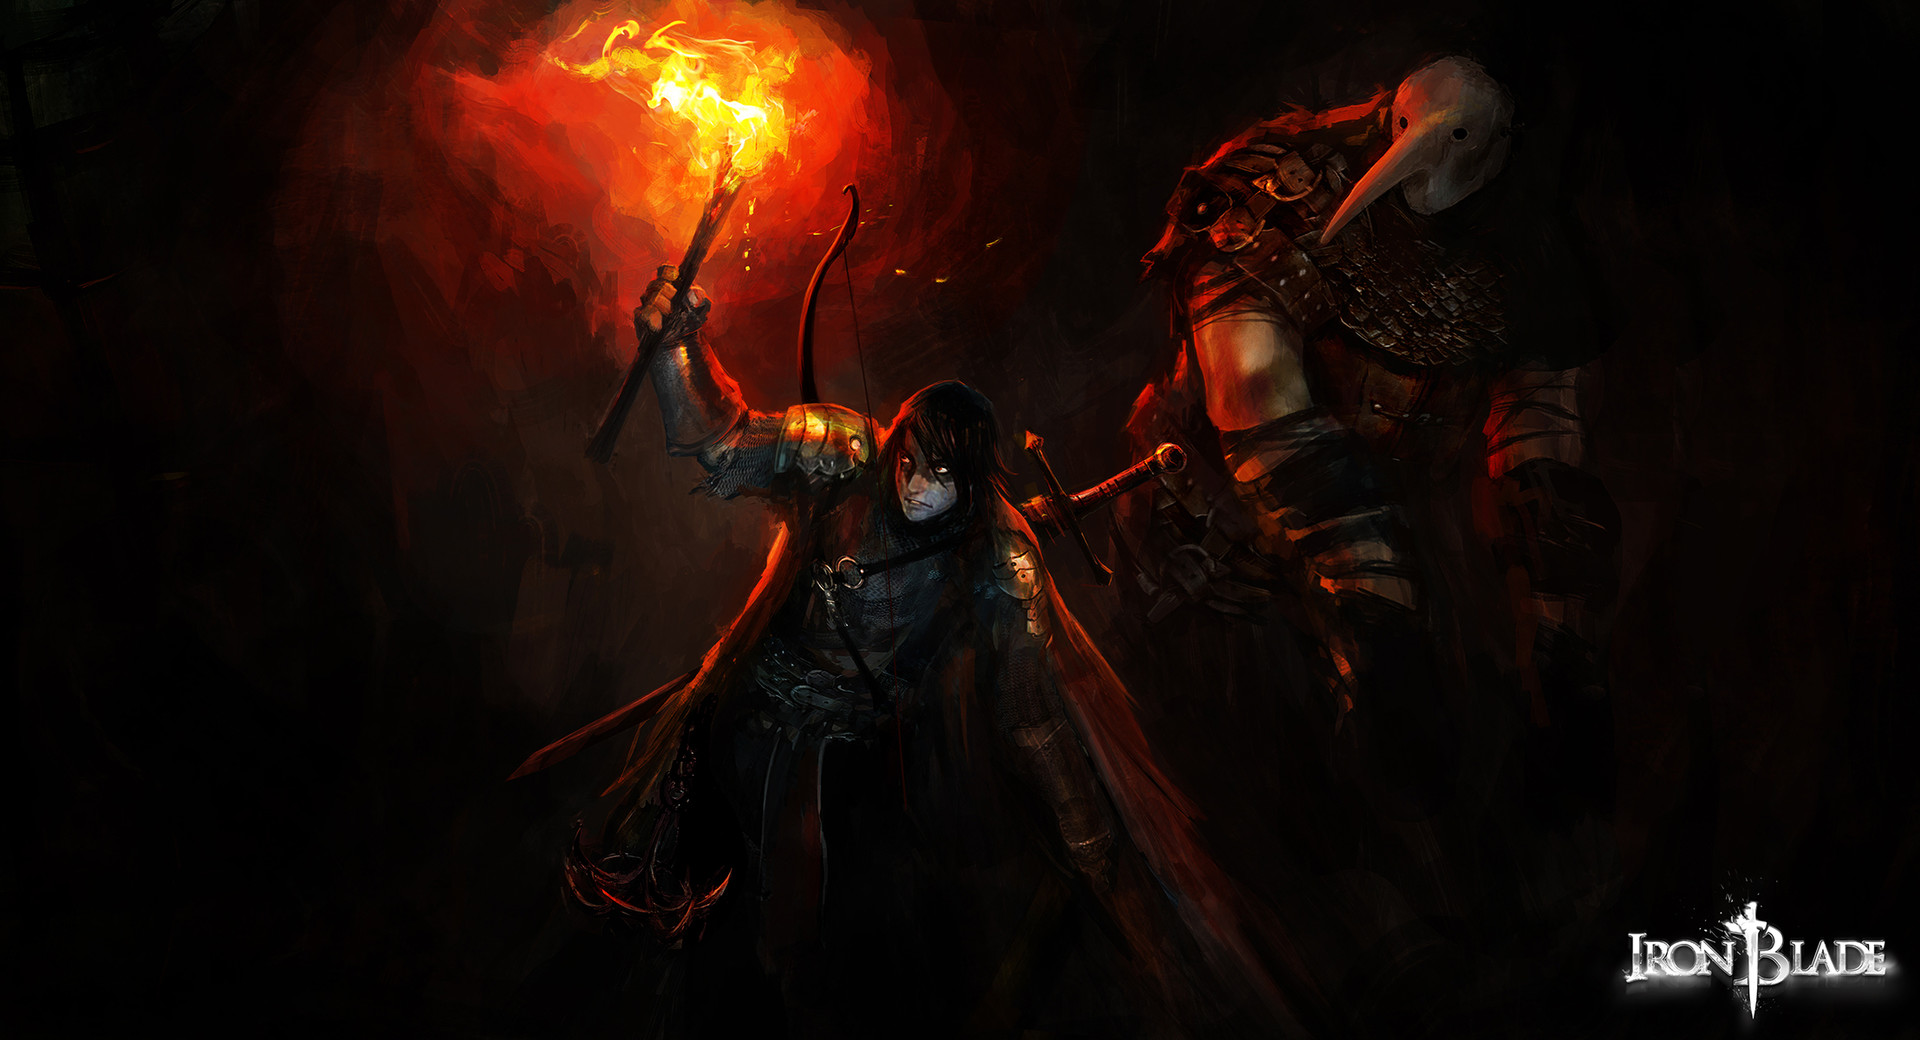 Alexandre chaudret gca characters ennemies situation 12